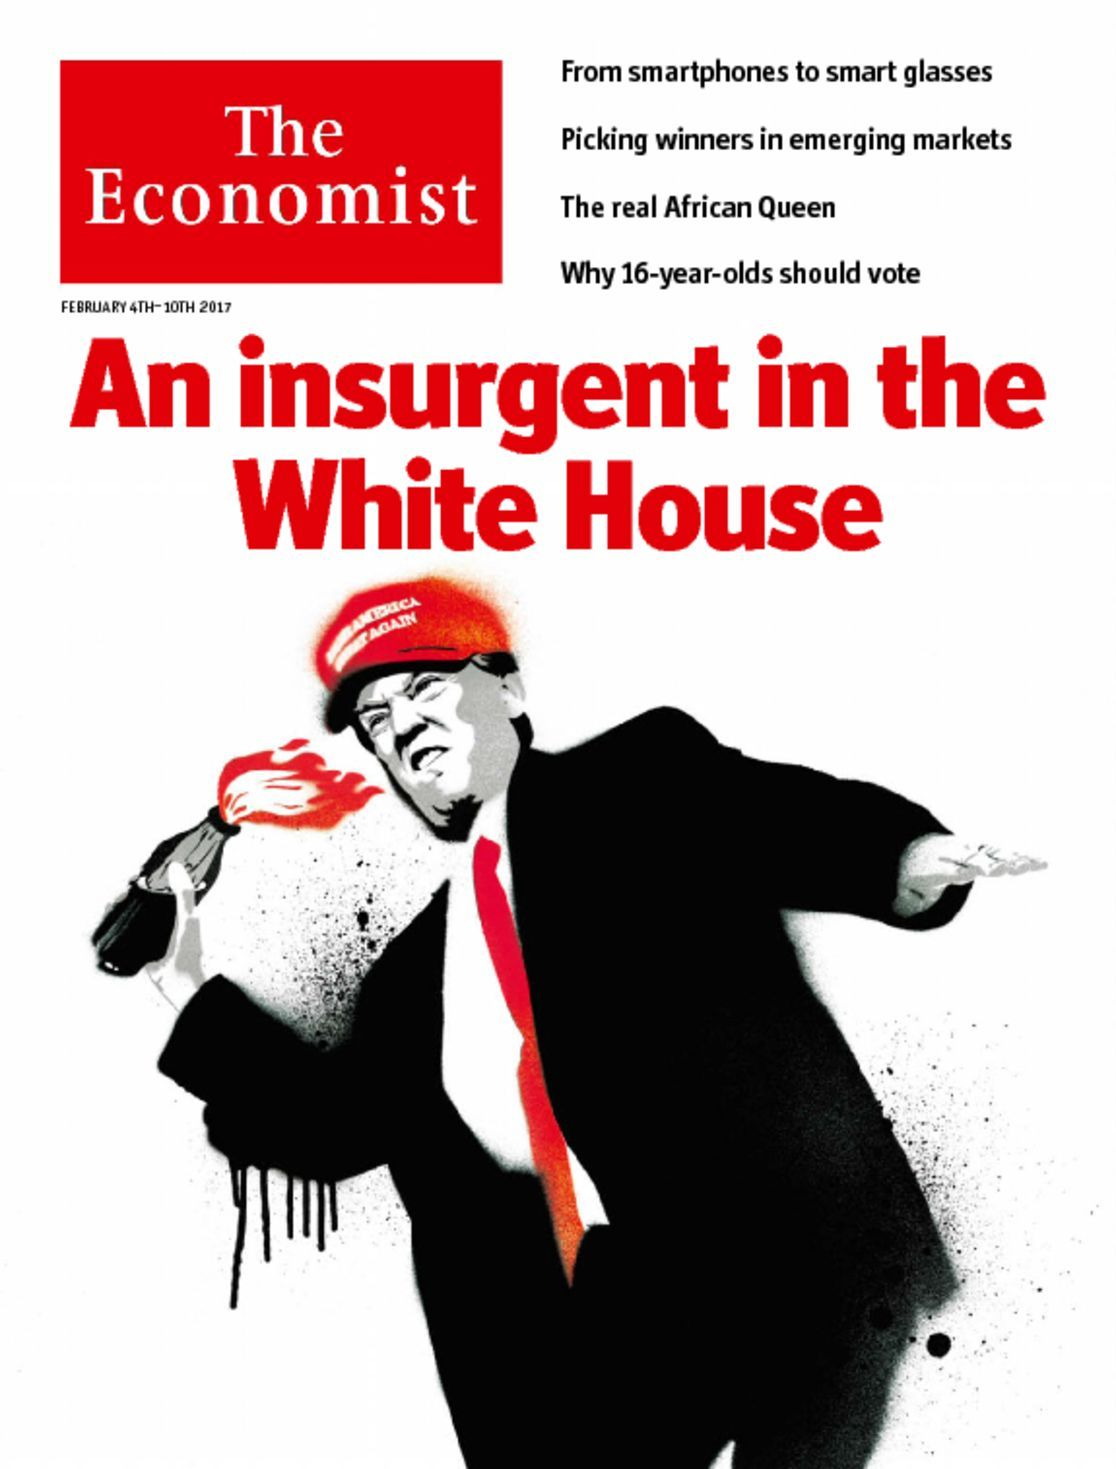 The Economist (Digital) Magazine - DiscountMags.com